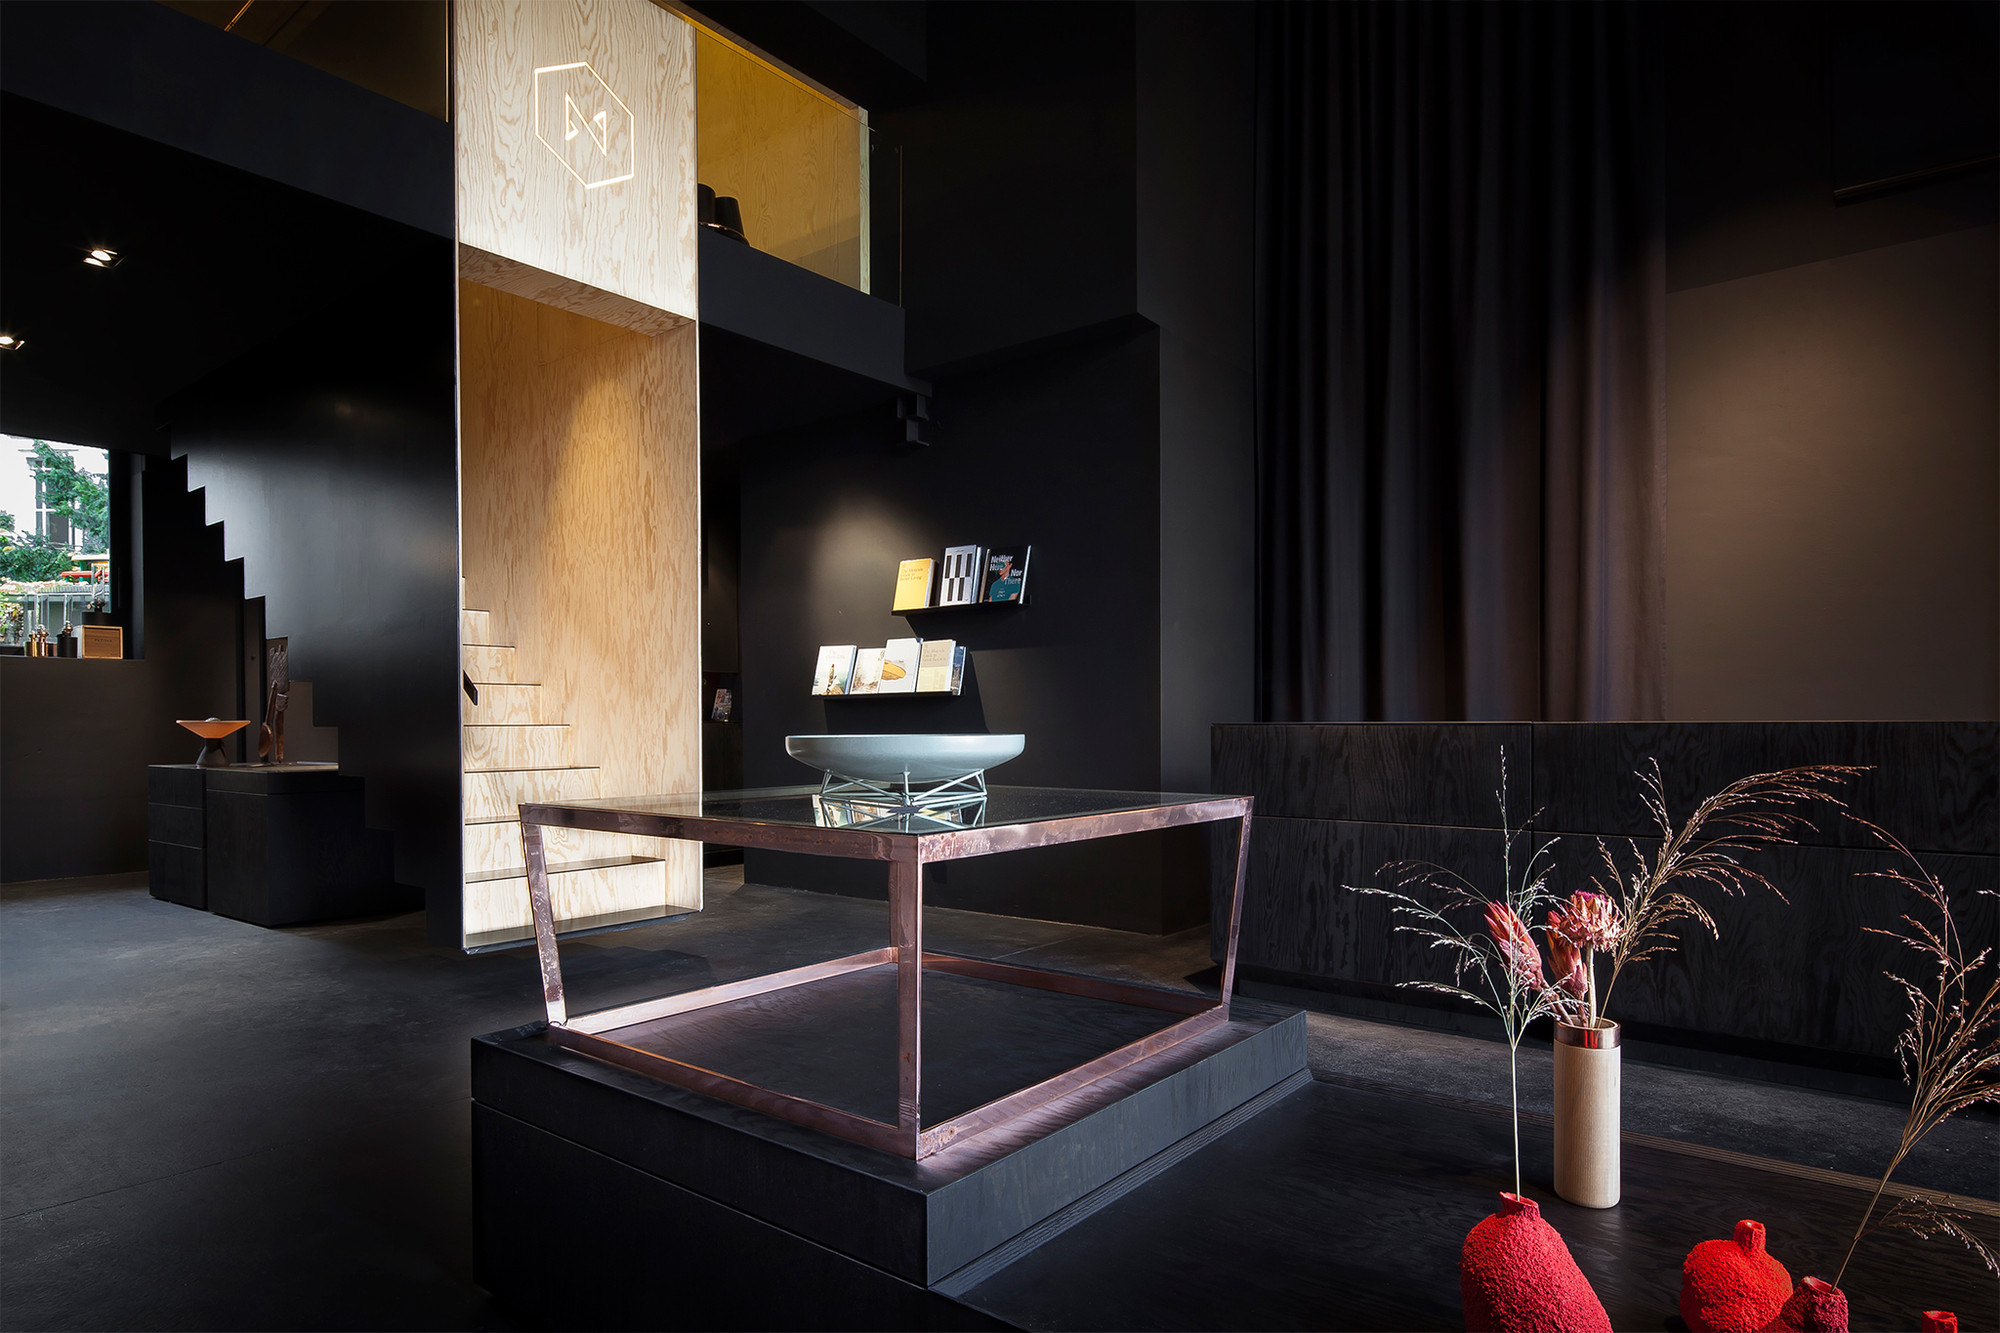 Gallery of bazar noir hidden fortress 13 for All black room design